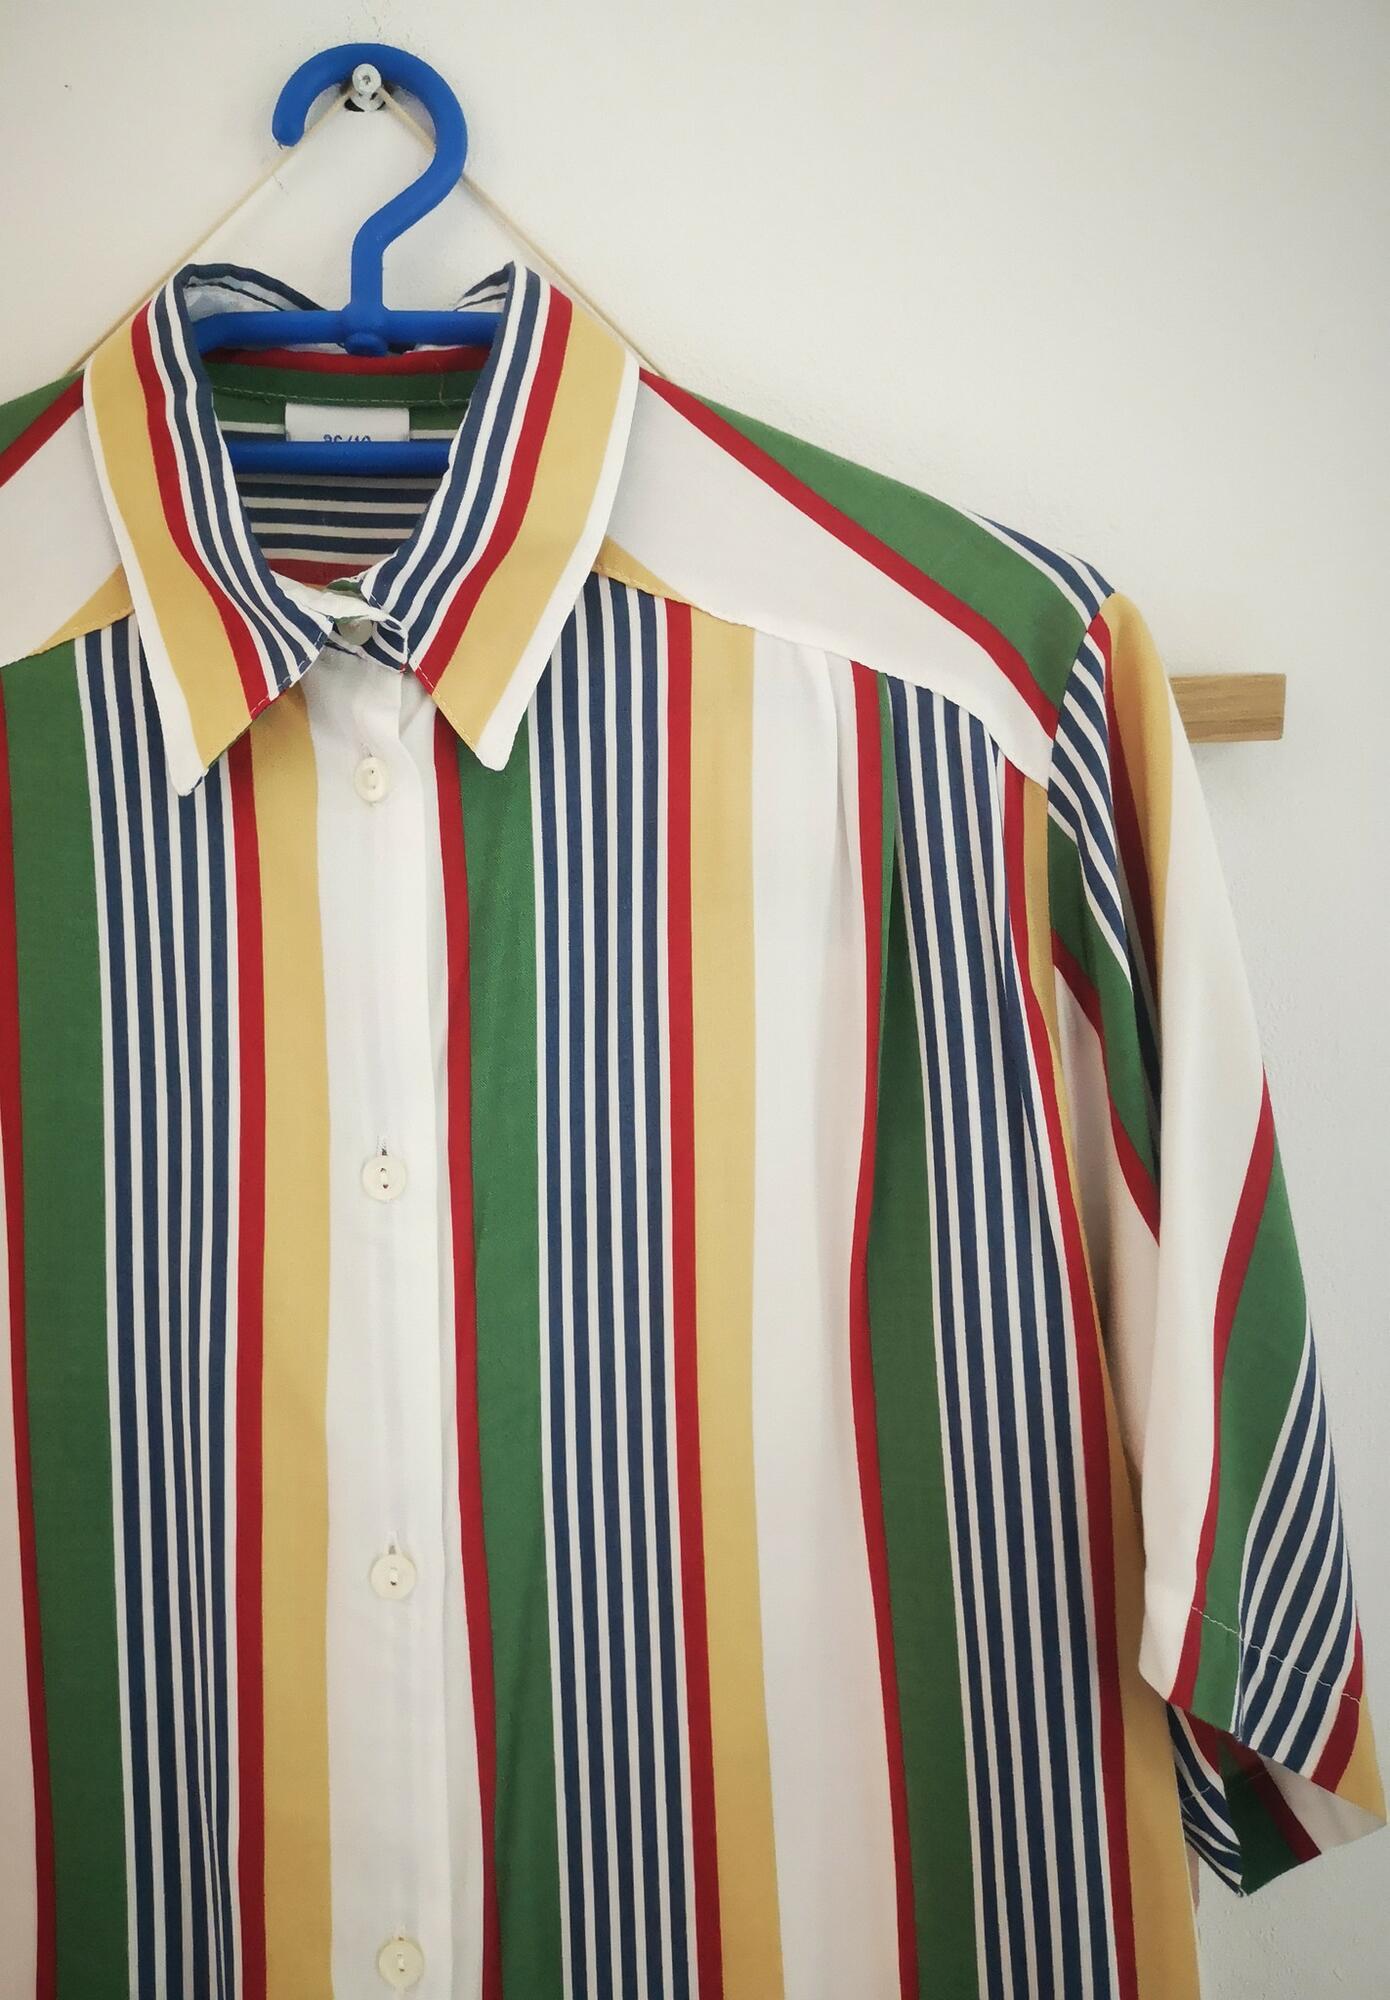 koszula vintage paski - Nie byle | JestemSlow.pl